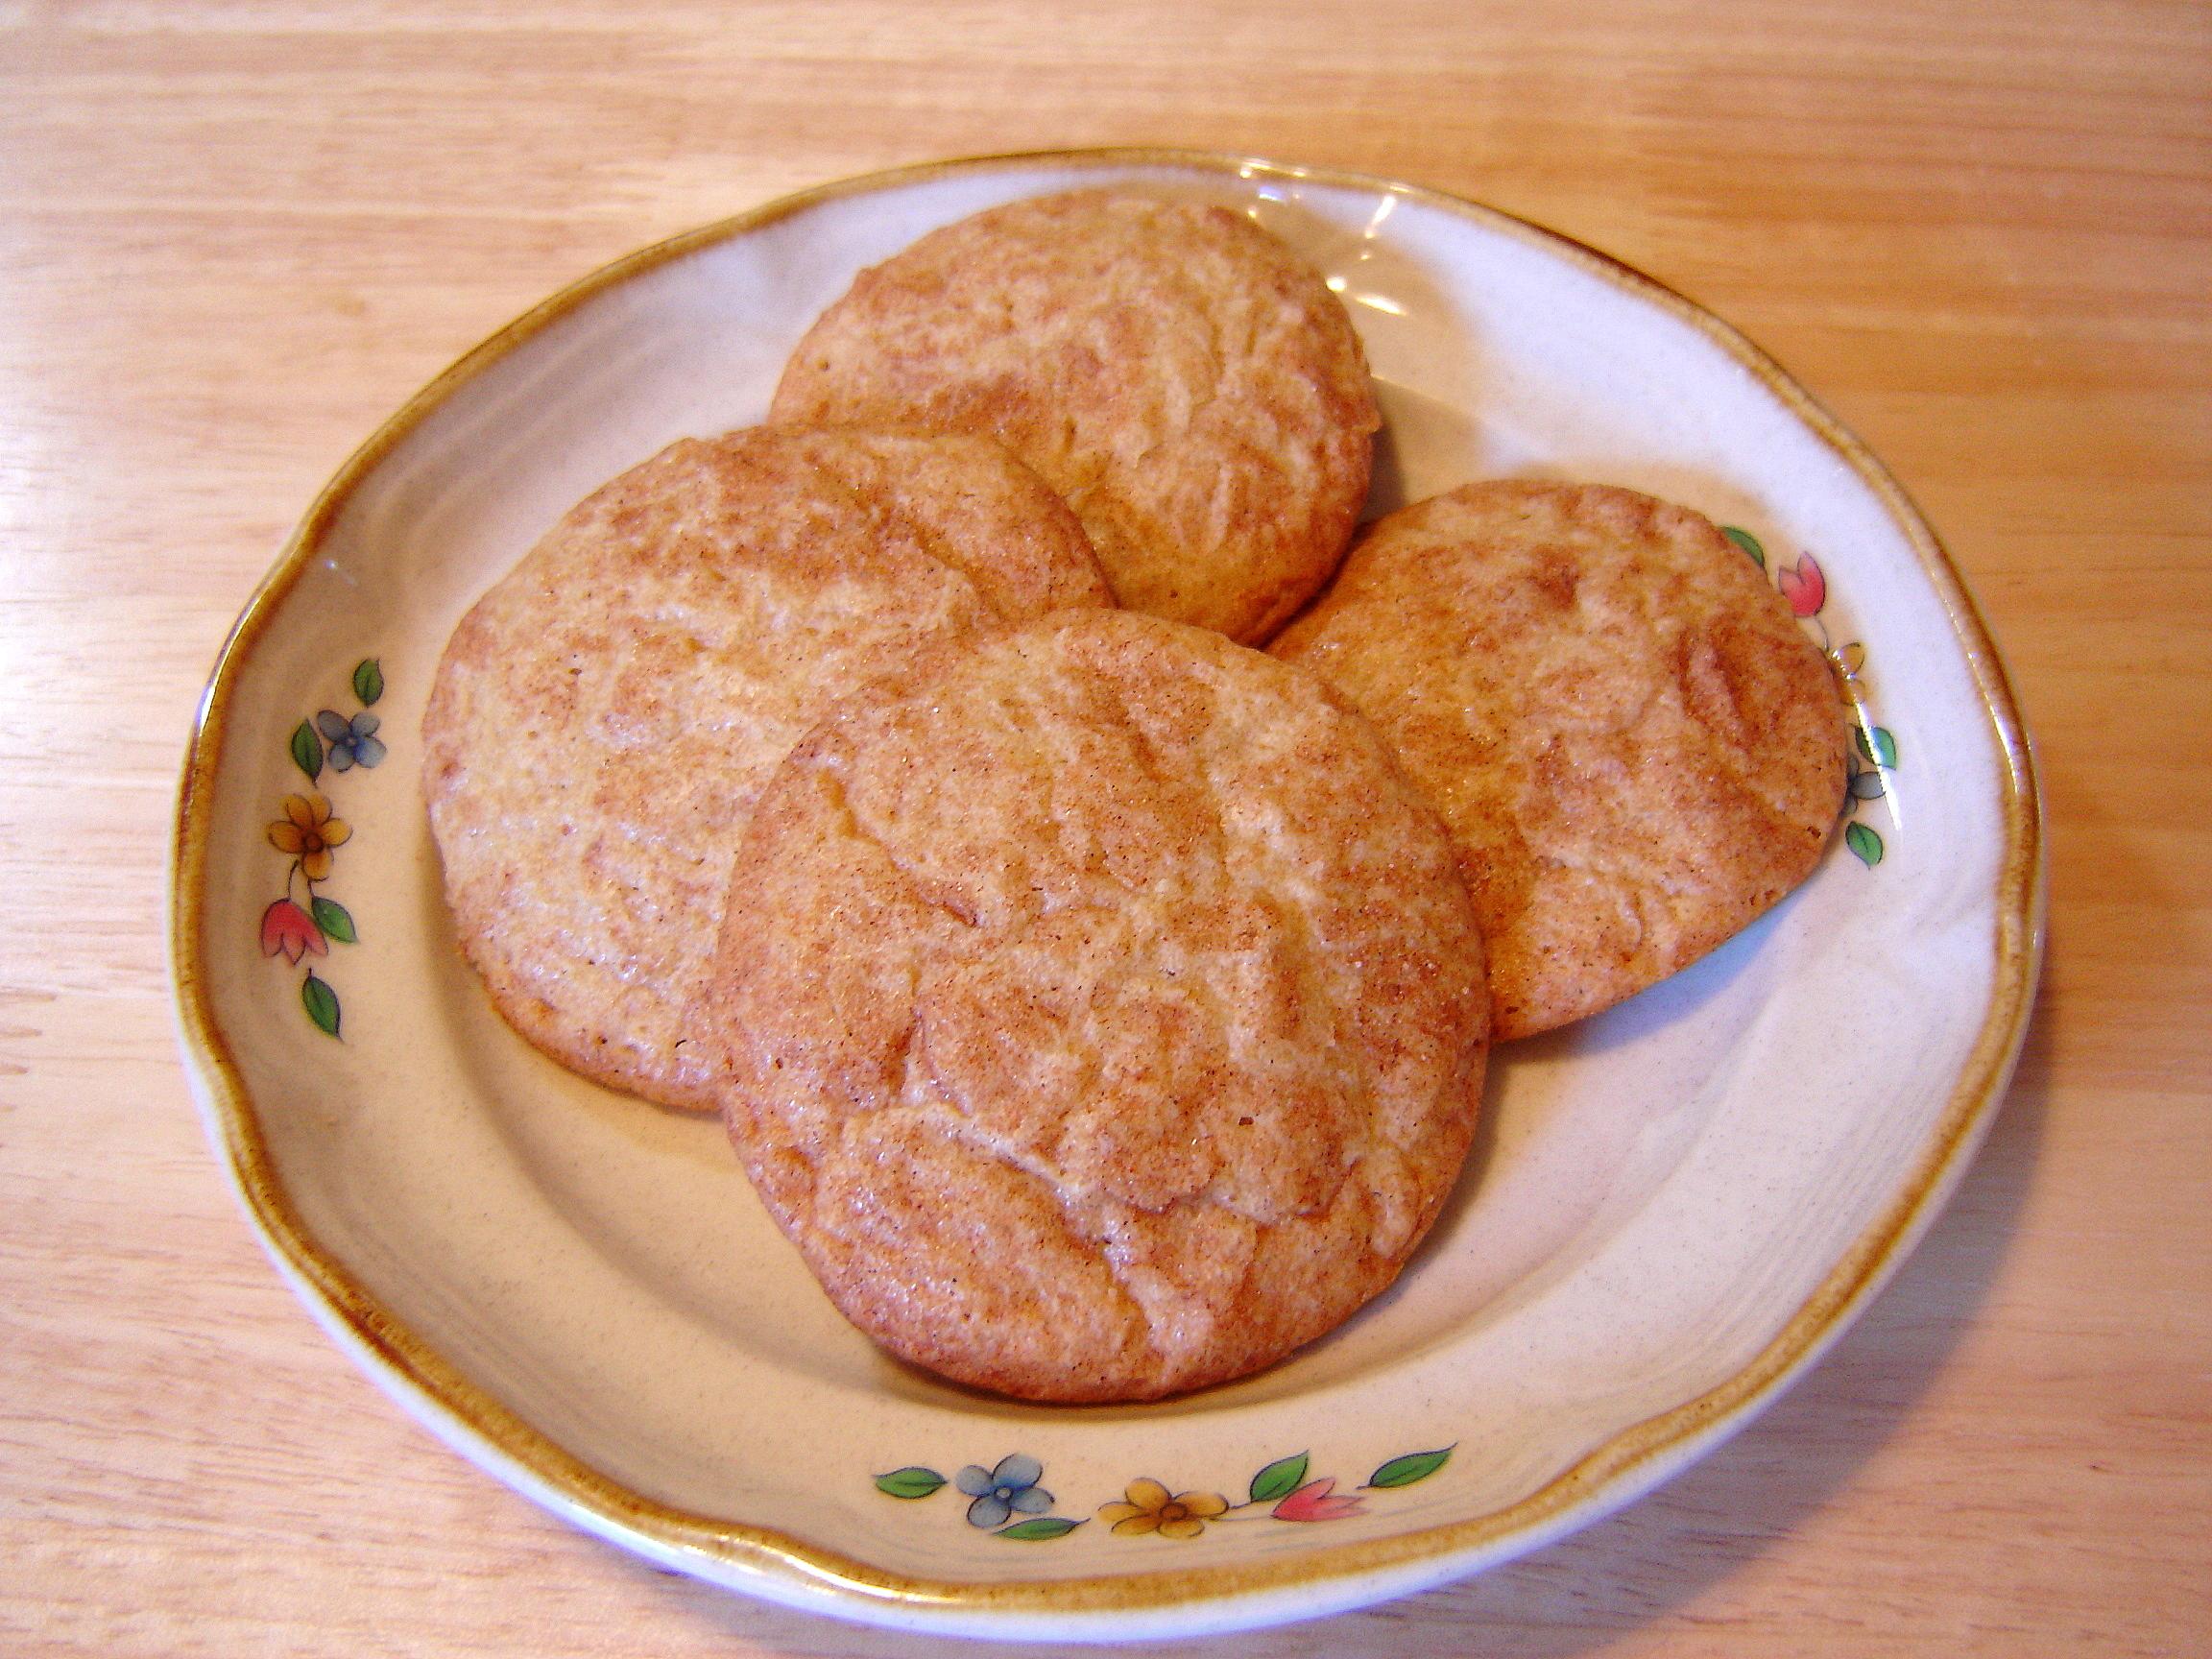 ... recipe #2 – Mrs. Fields Cinnamon Sugar Cookies | At Home in Alaska